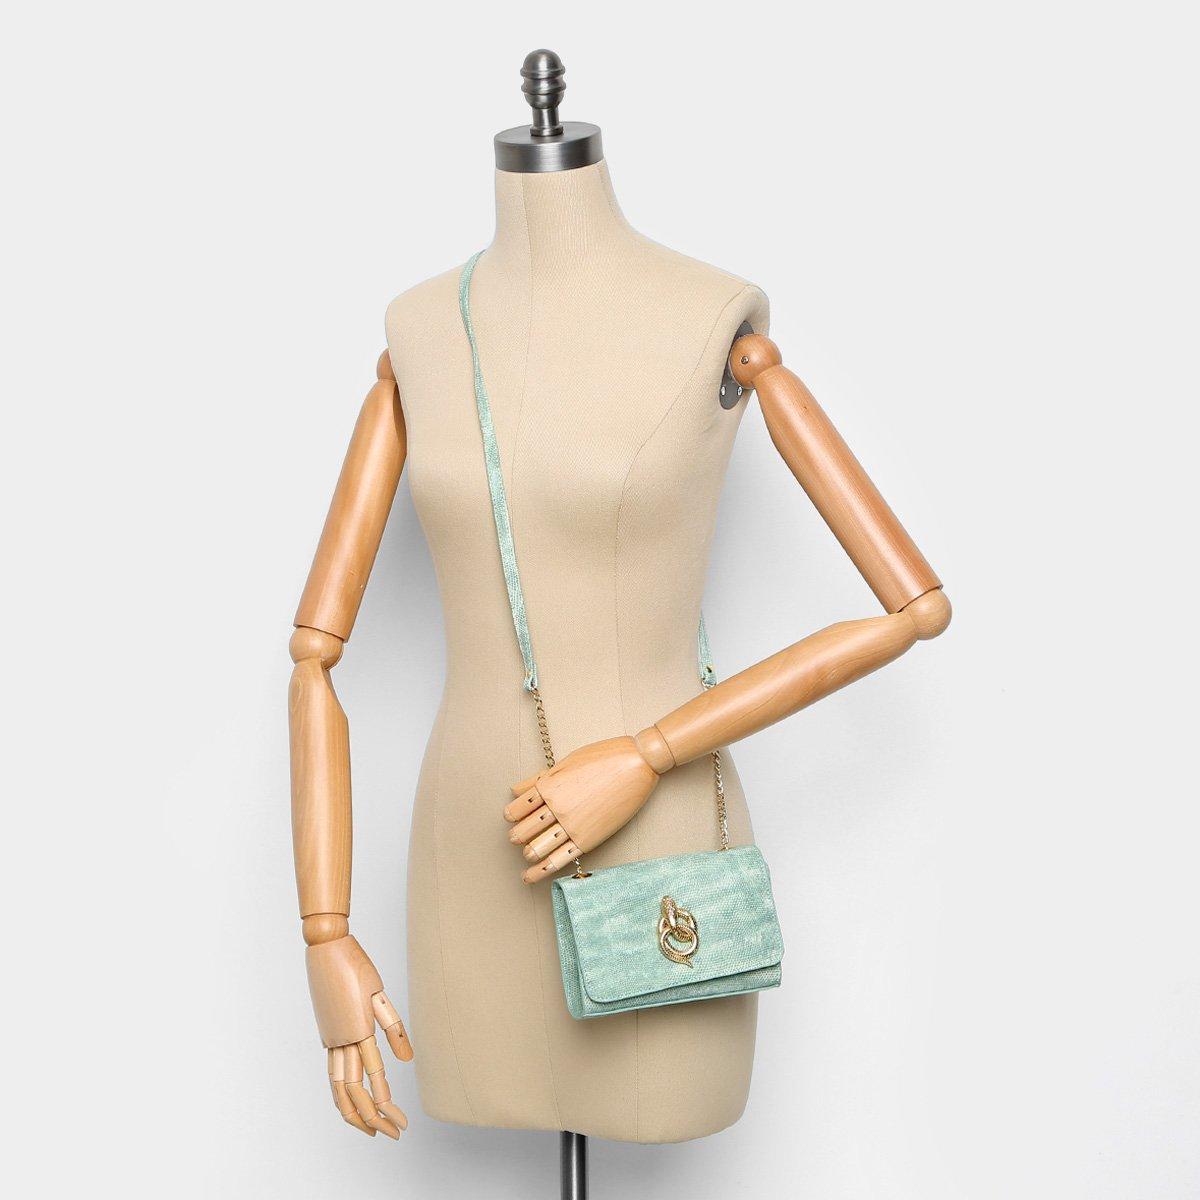 33794ae9d Bolsa Colcci Mini Bag Cobra Alça Corrente Feminina - Shopping TudoAzul